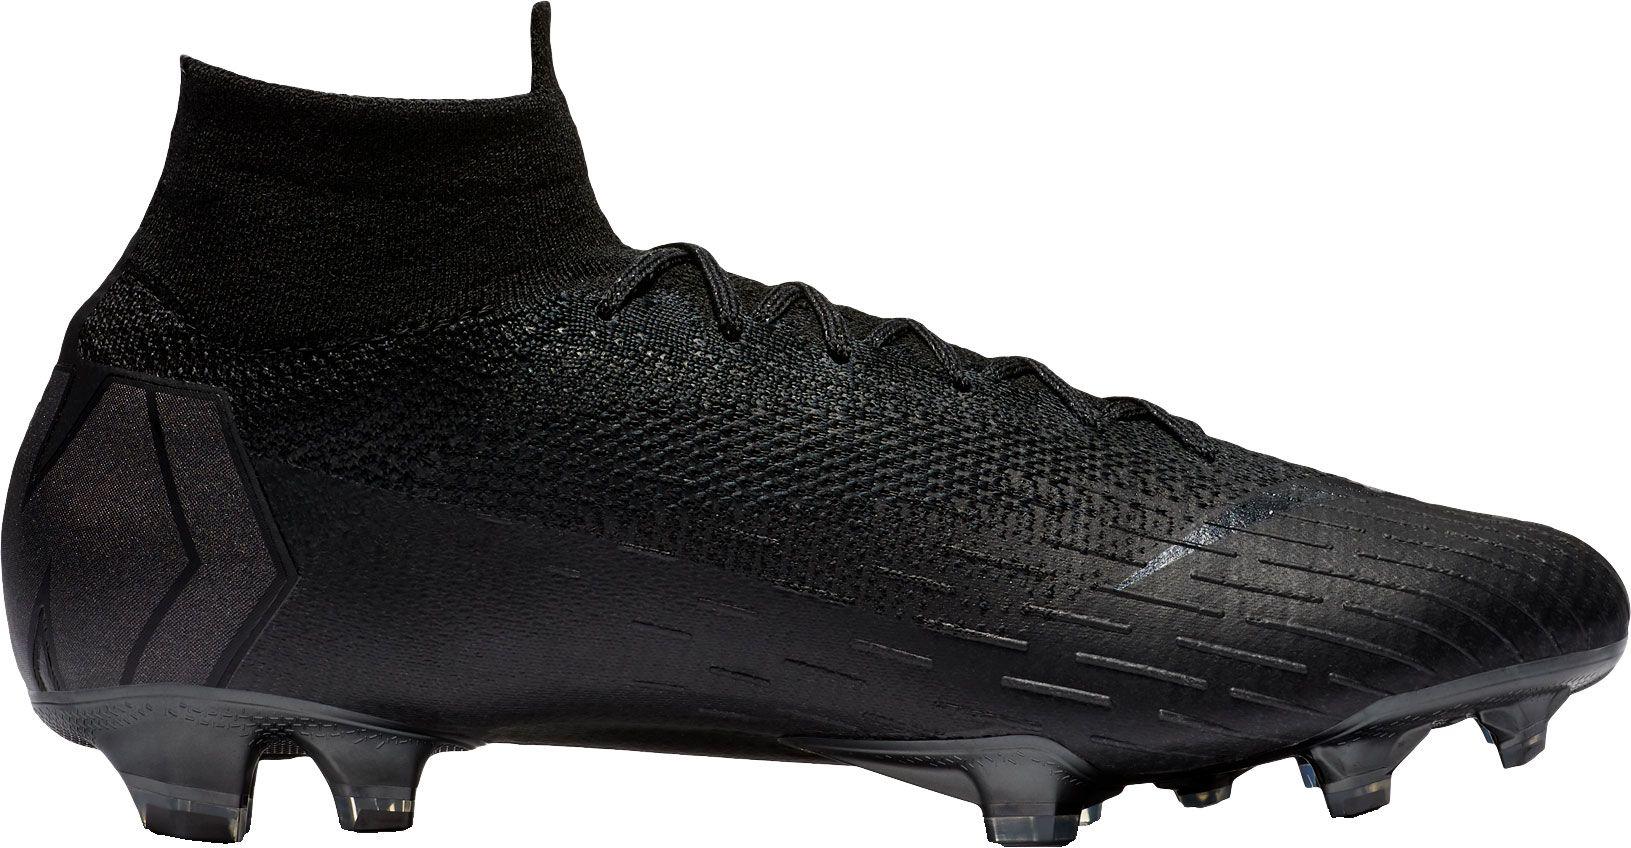 Nike Mercurial Superfly 360 Elite FG Soccer Cleats, Men's, Size: 8.0, Black